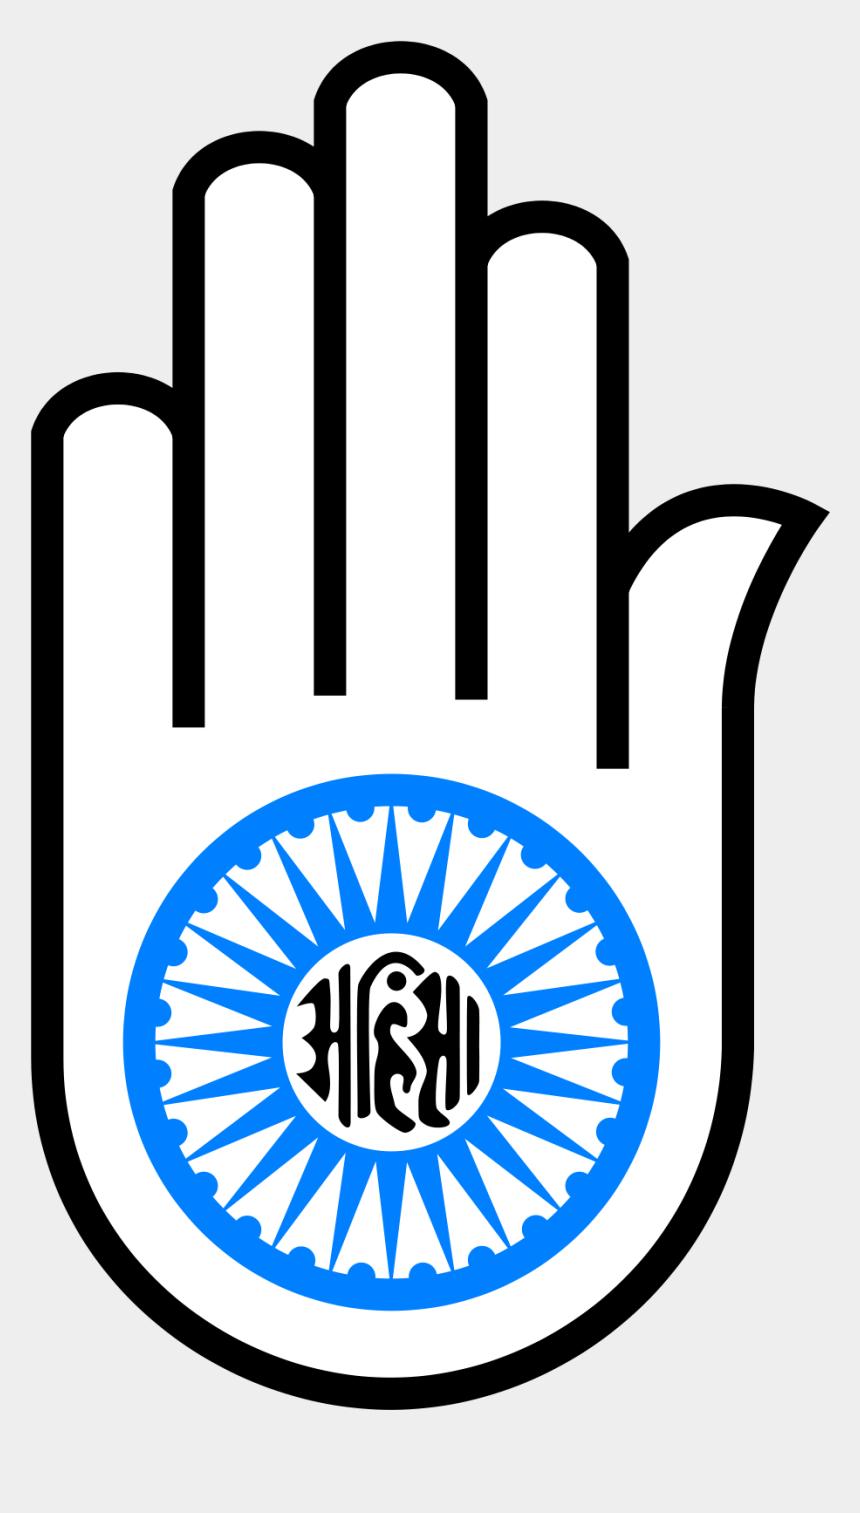 buddhist symbols clip art, Cartoons - Symbol Of Jainism And Buddhism